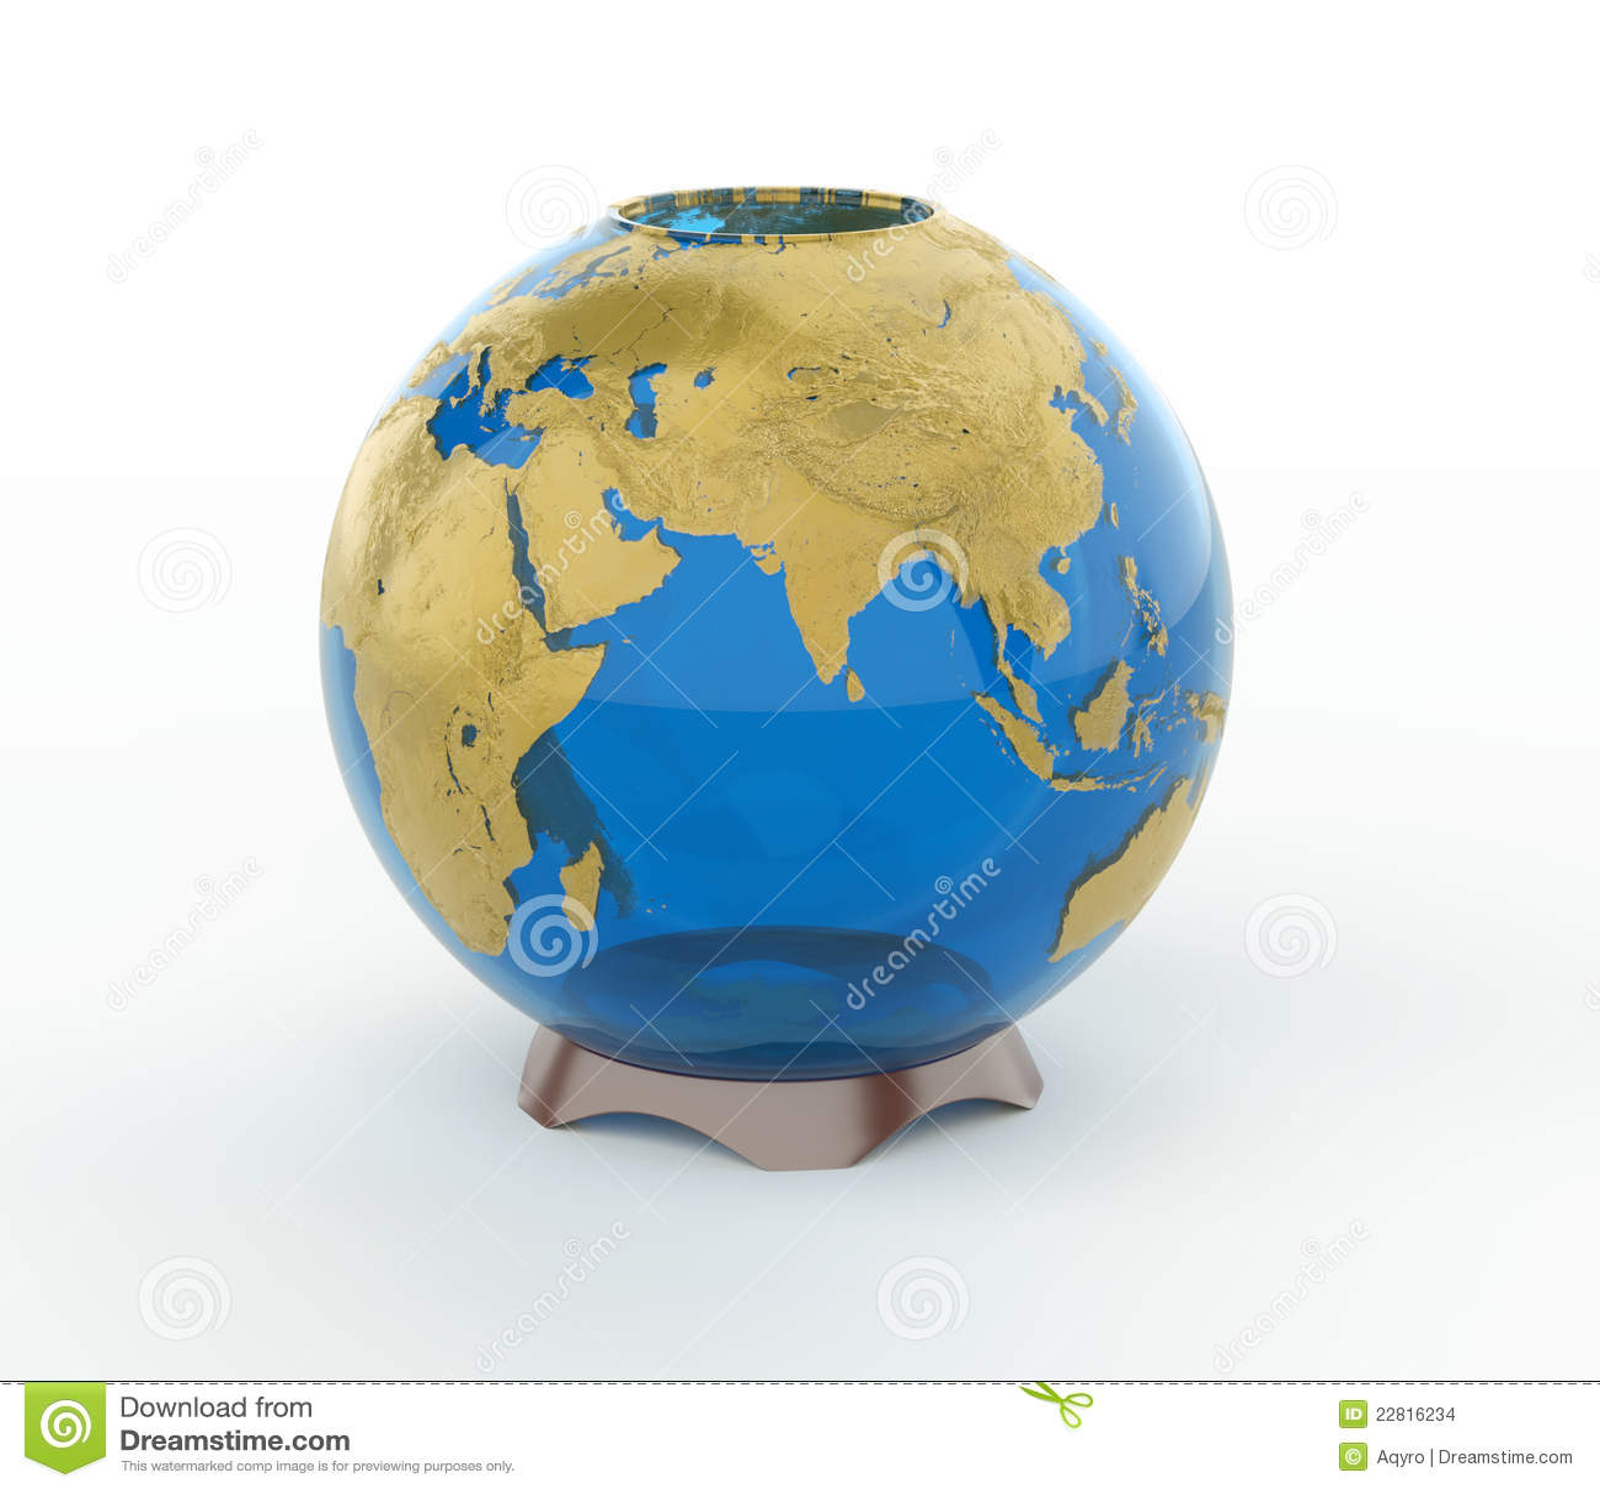 Glass Vase Earth 3d Model Stock Images - Image: 22816234